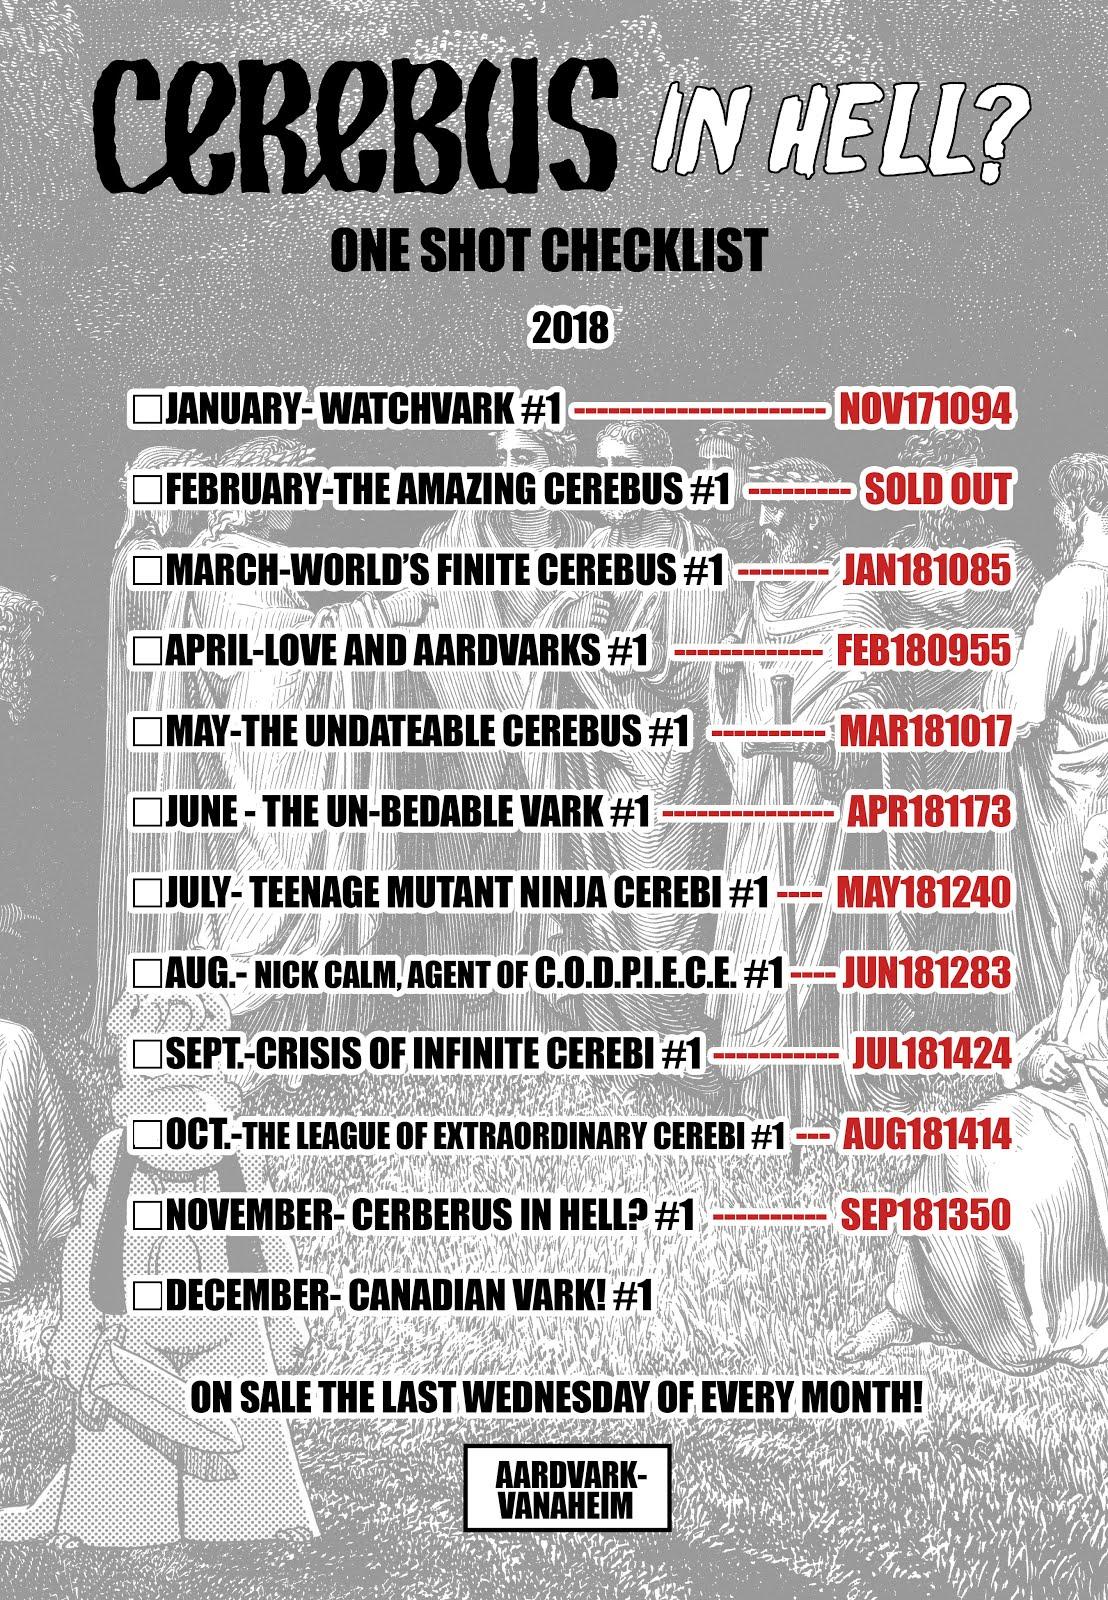 CIH? 2018 Checklist